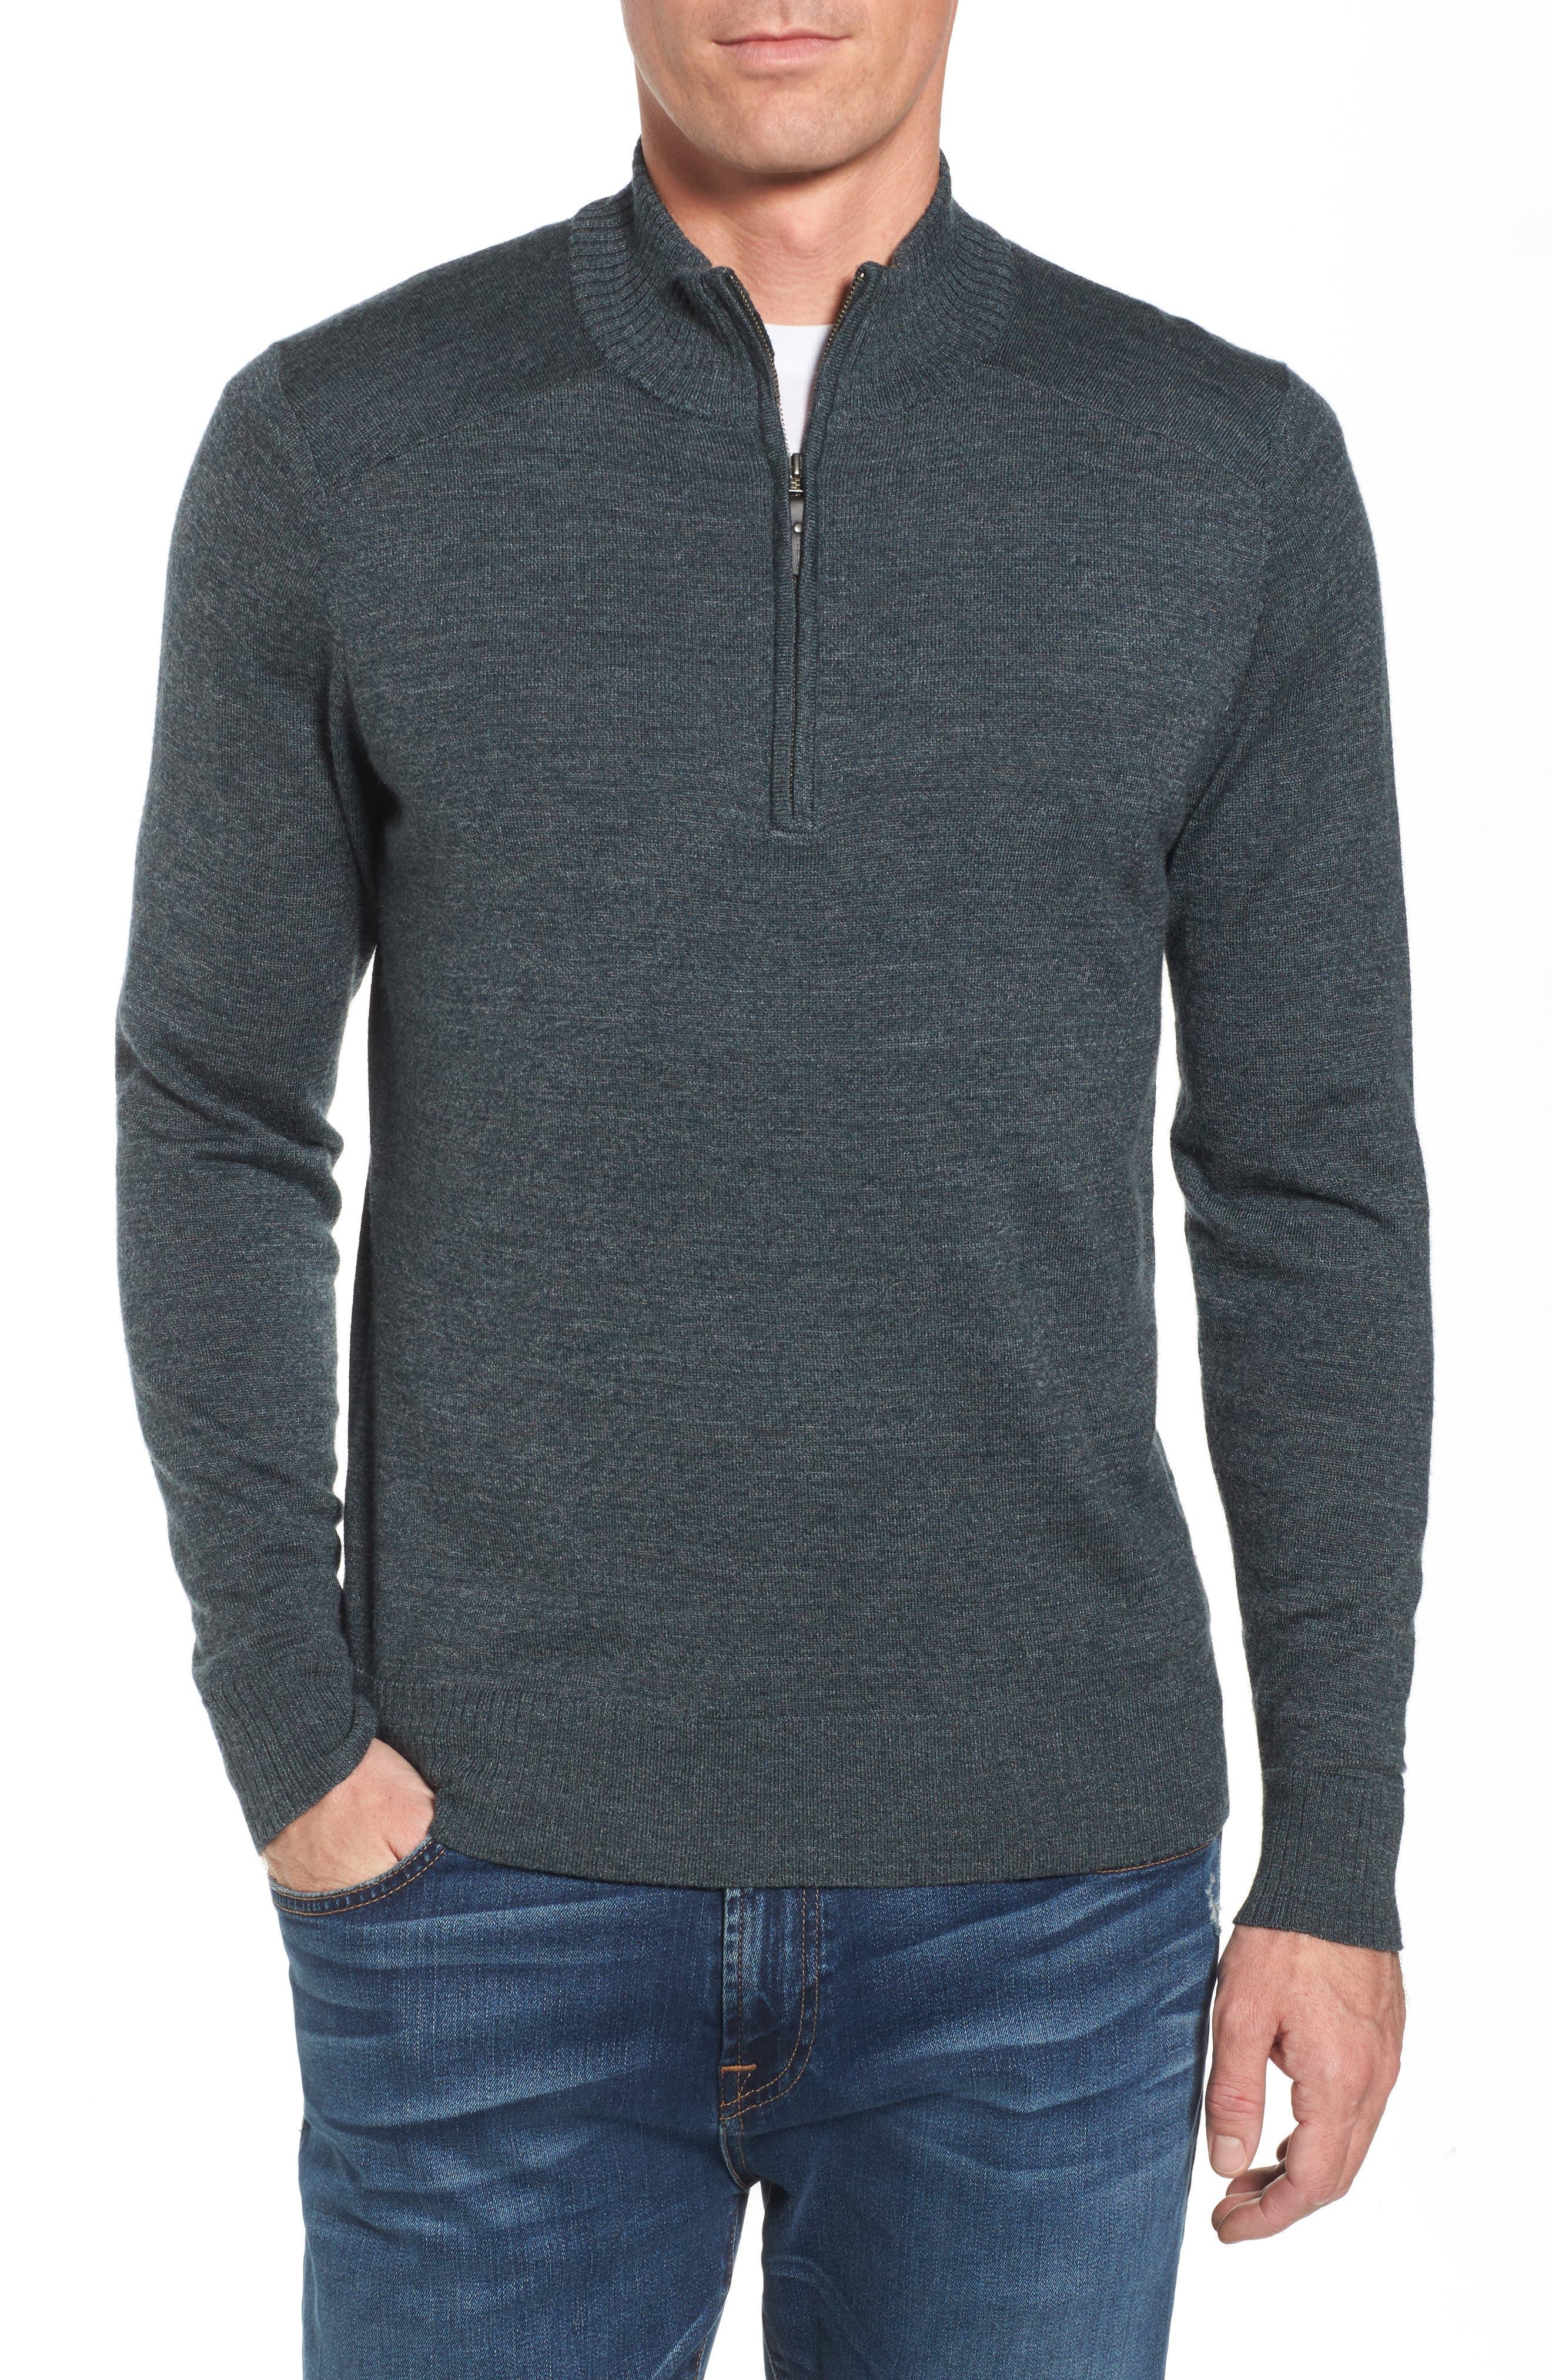 Smartwool Kiva Ridge Merino Wool Blend Pullover